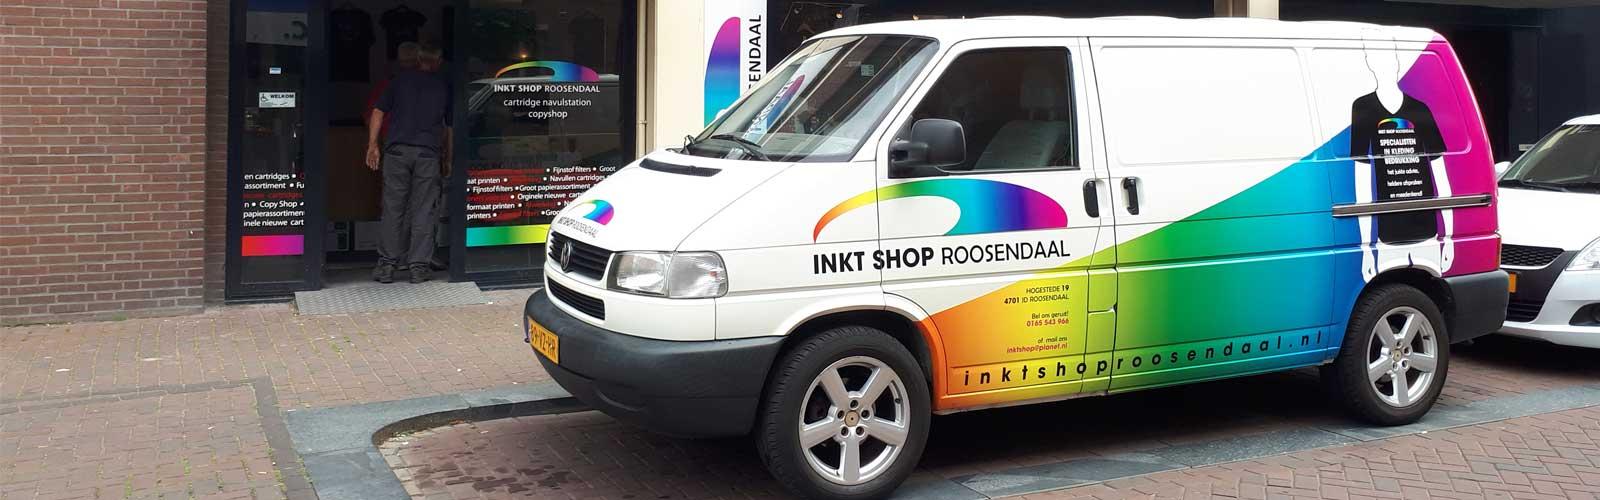 Inktshop Roosendaal slider 2